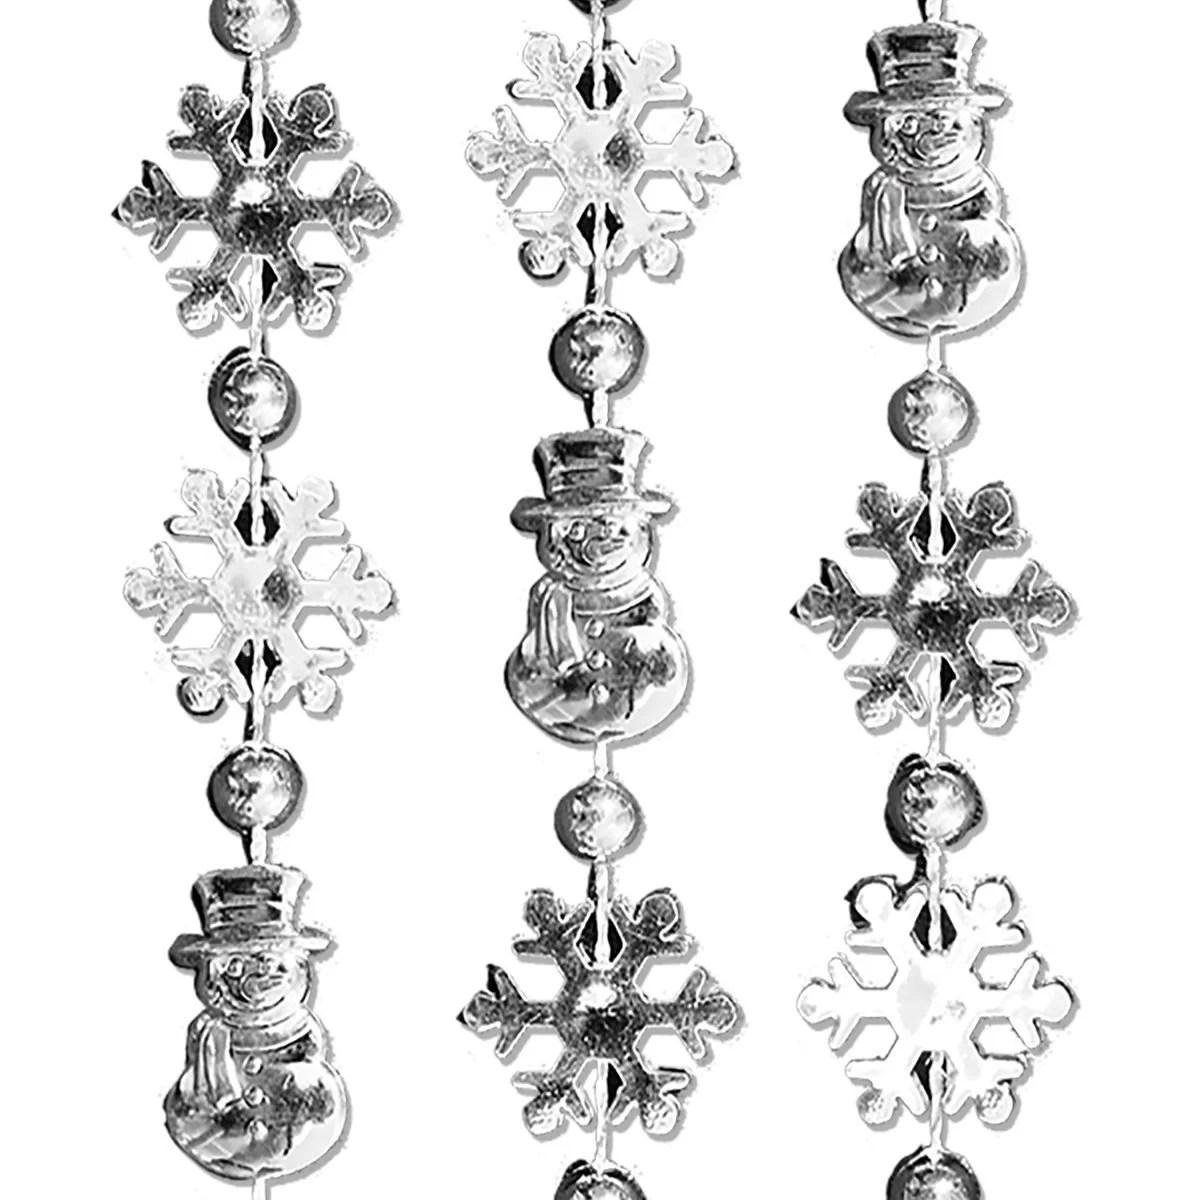 Snowmen Snowflake Bead Necklace Pack Of 12 Magic Matt S